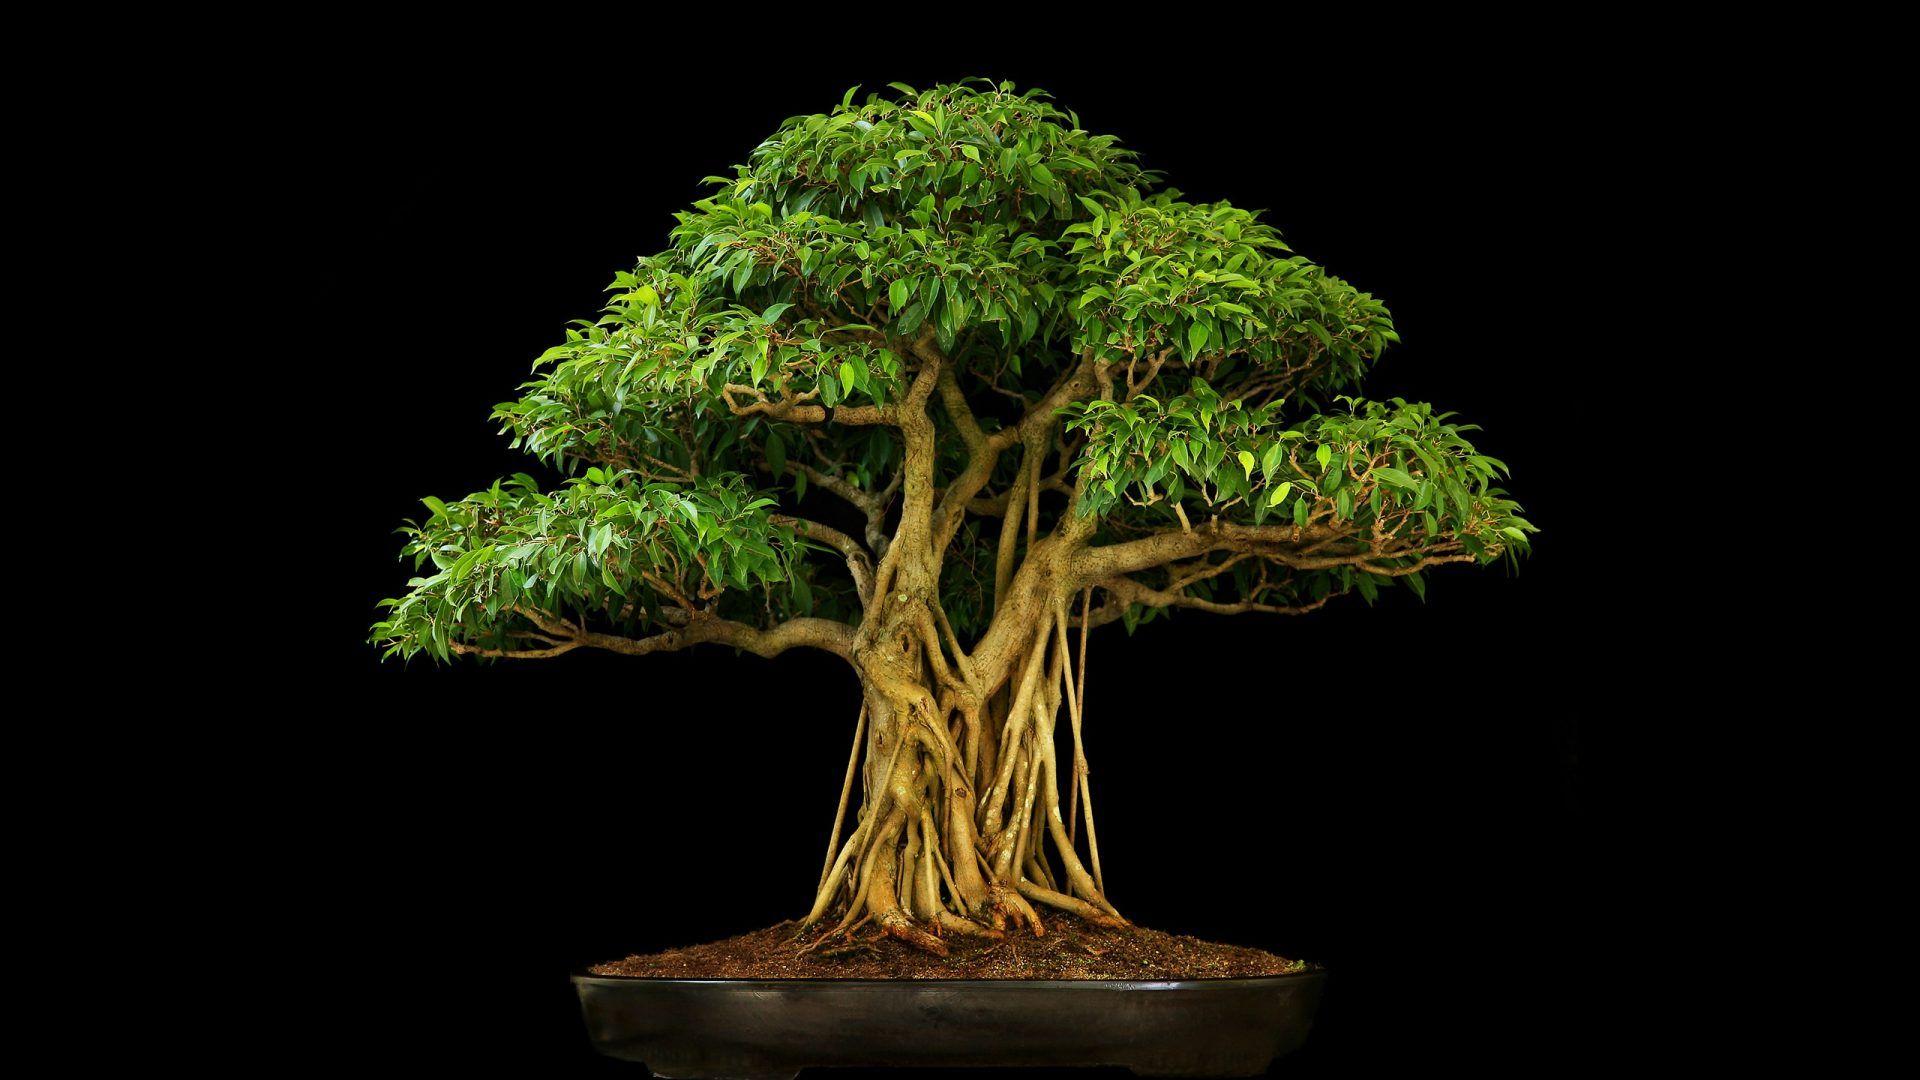 Trees tree black bonsai leaves beautiful nature - Nature wallpaper hd 16 9 ...